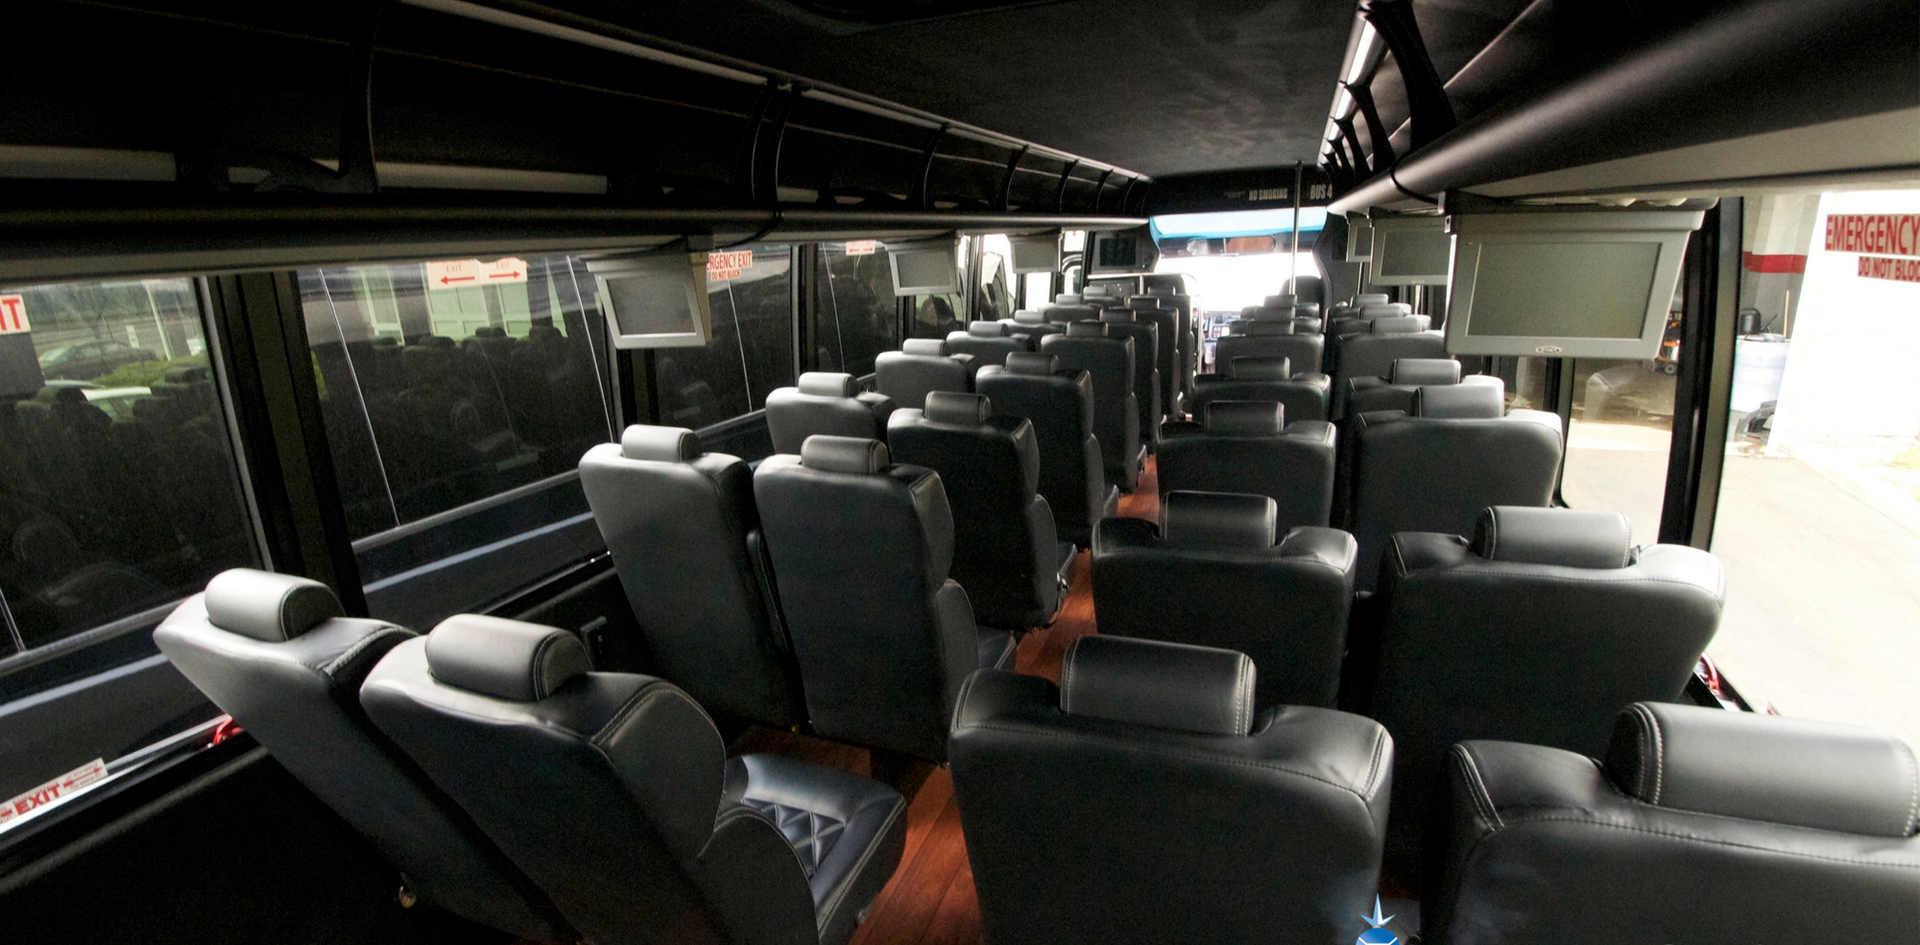 40 Passenger Bus - Hiring Drivers